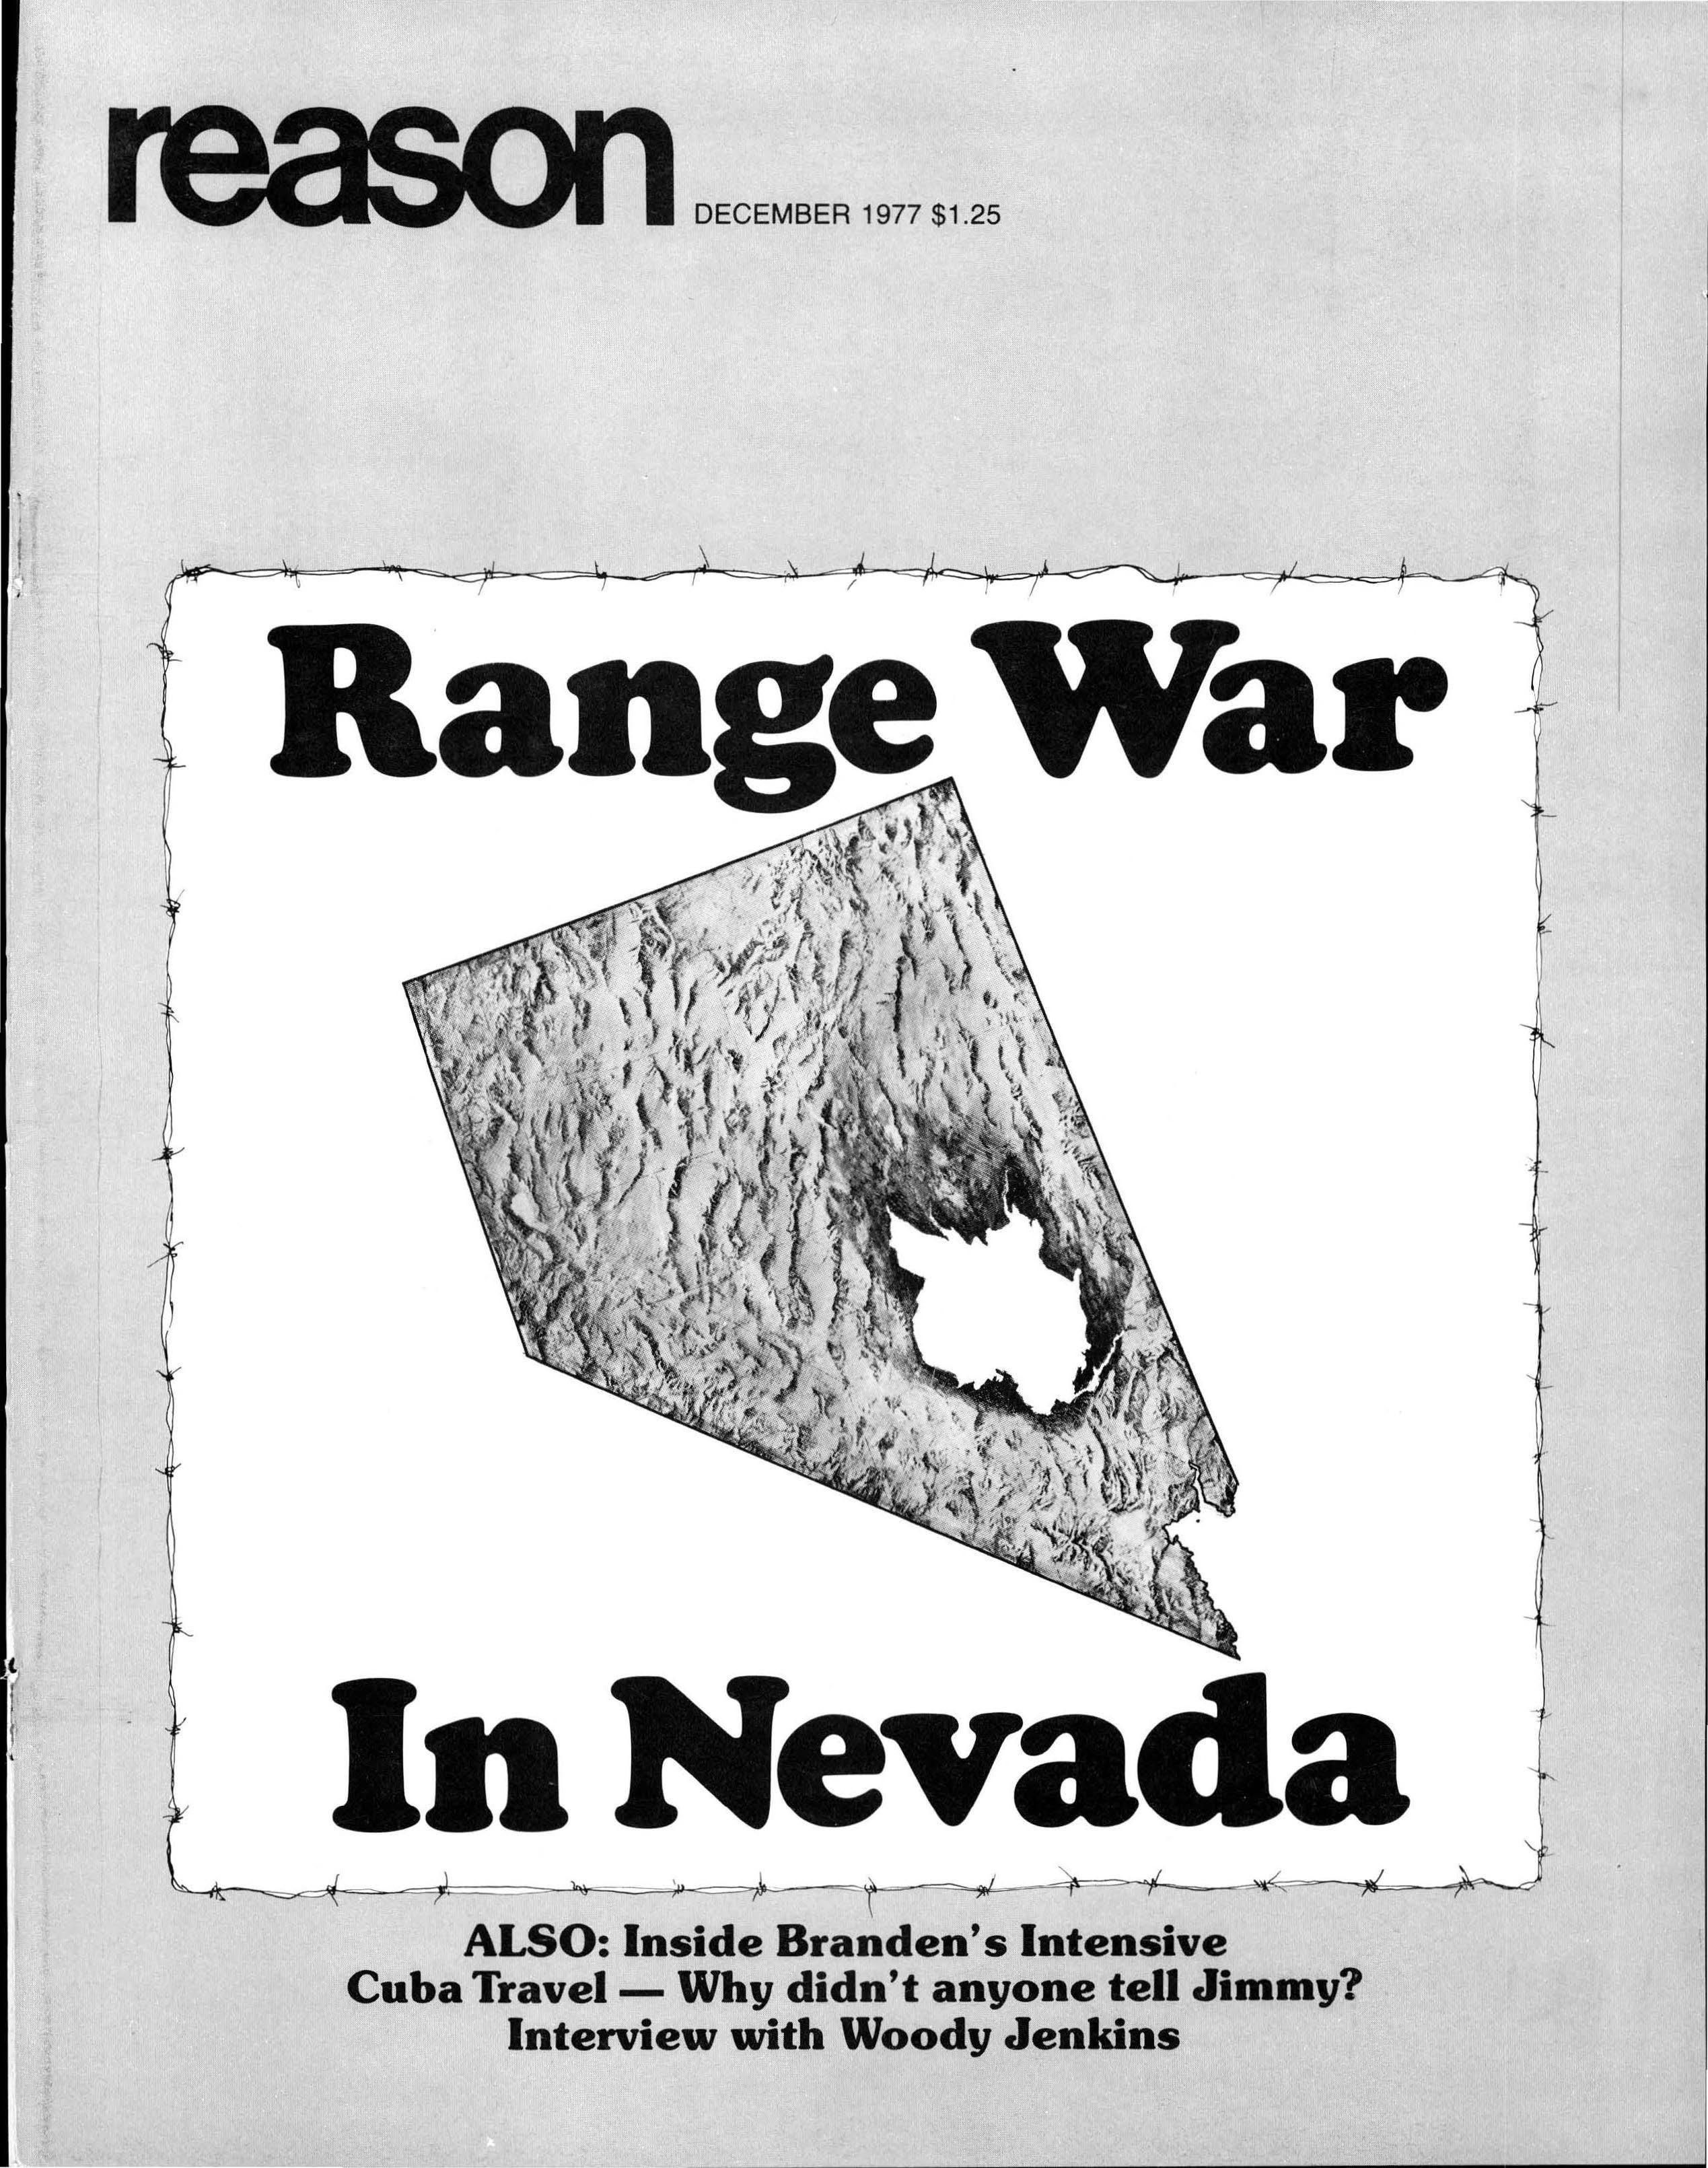 Reason Magazine, December 1977 cover image